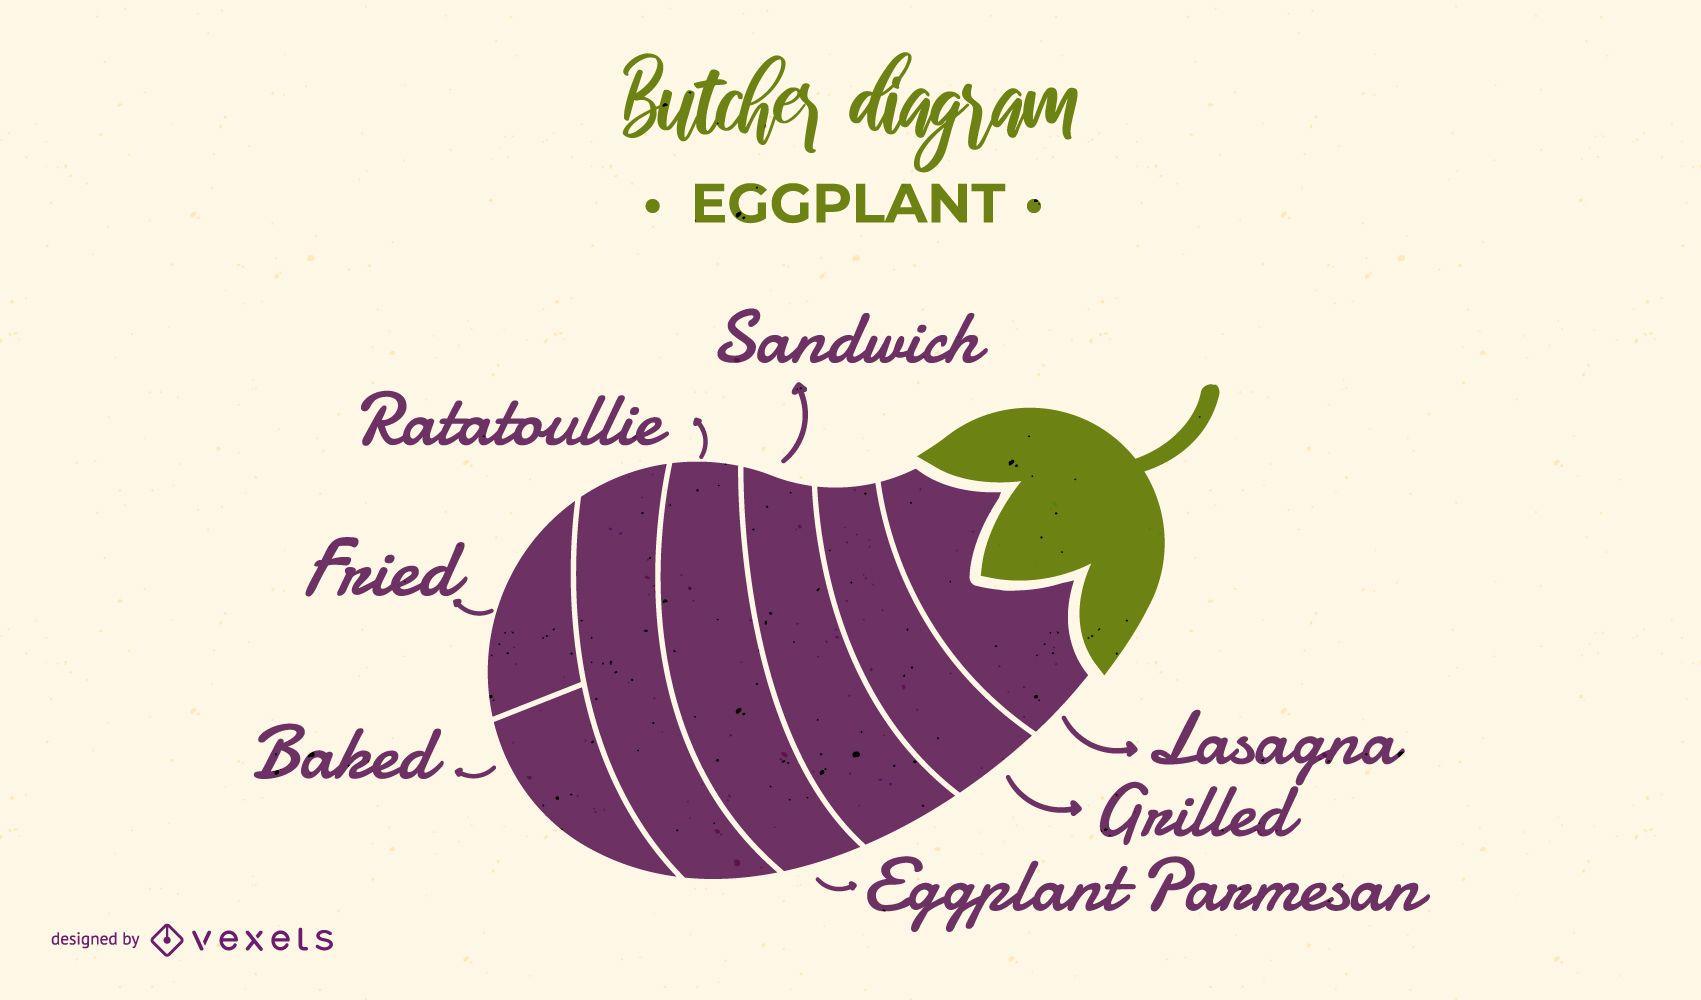 Eggplant Butcher Diagram